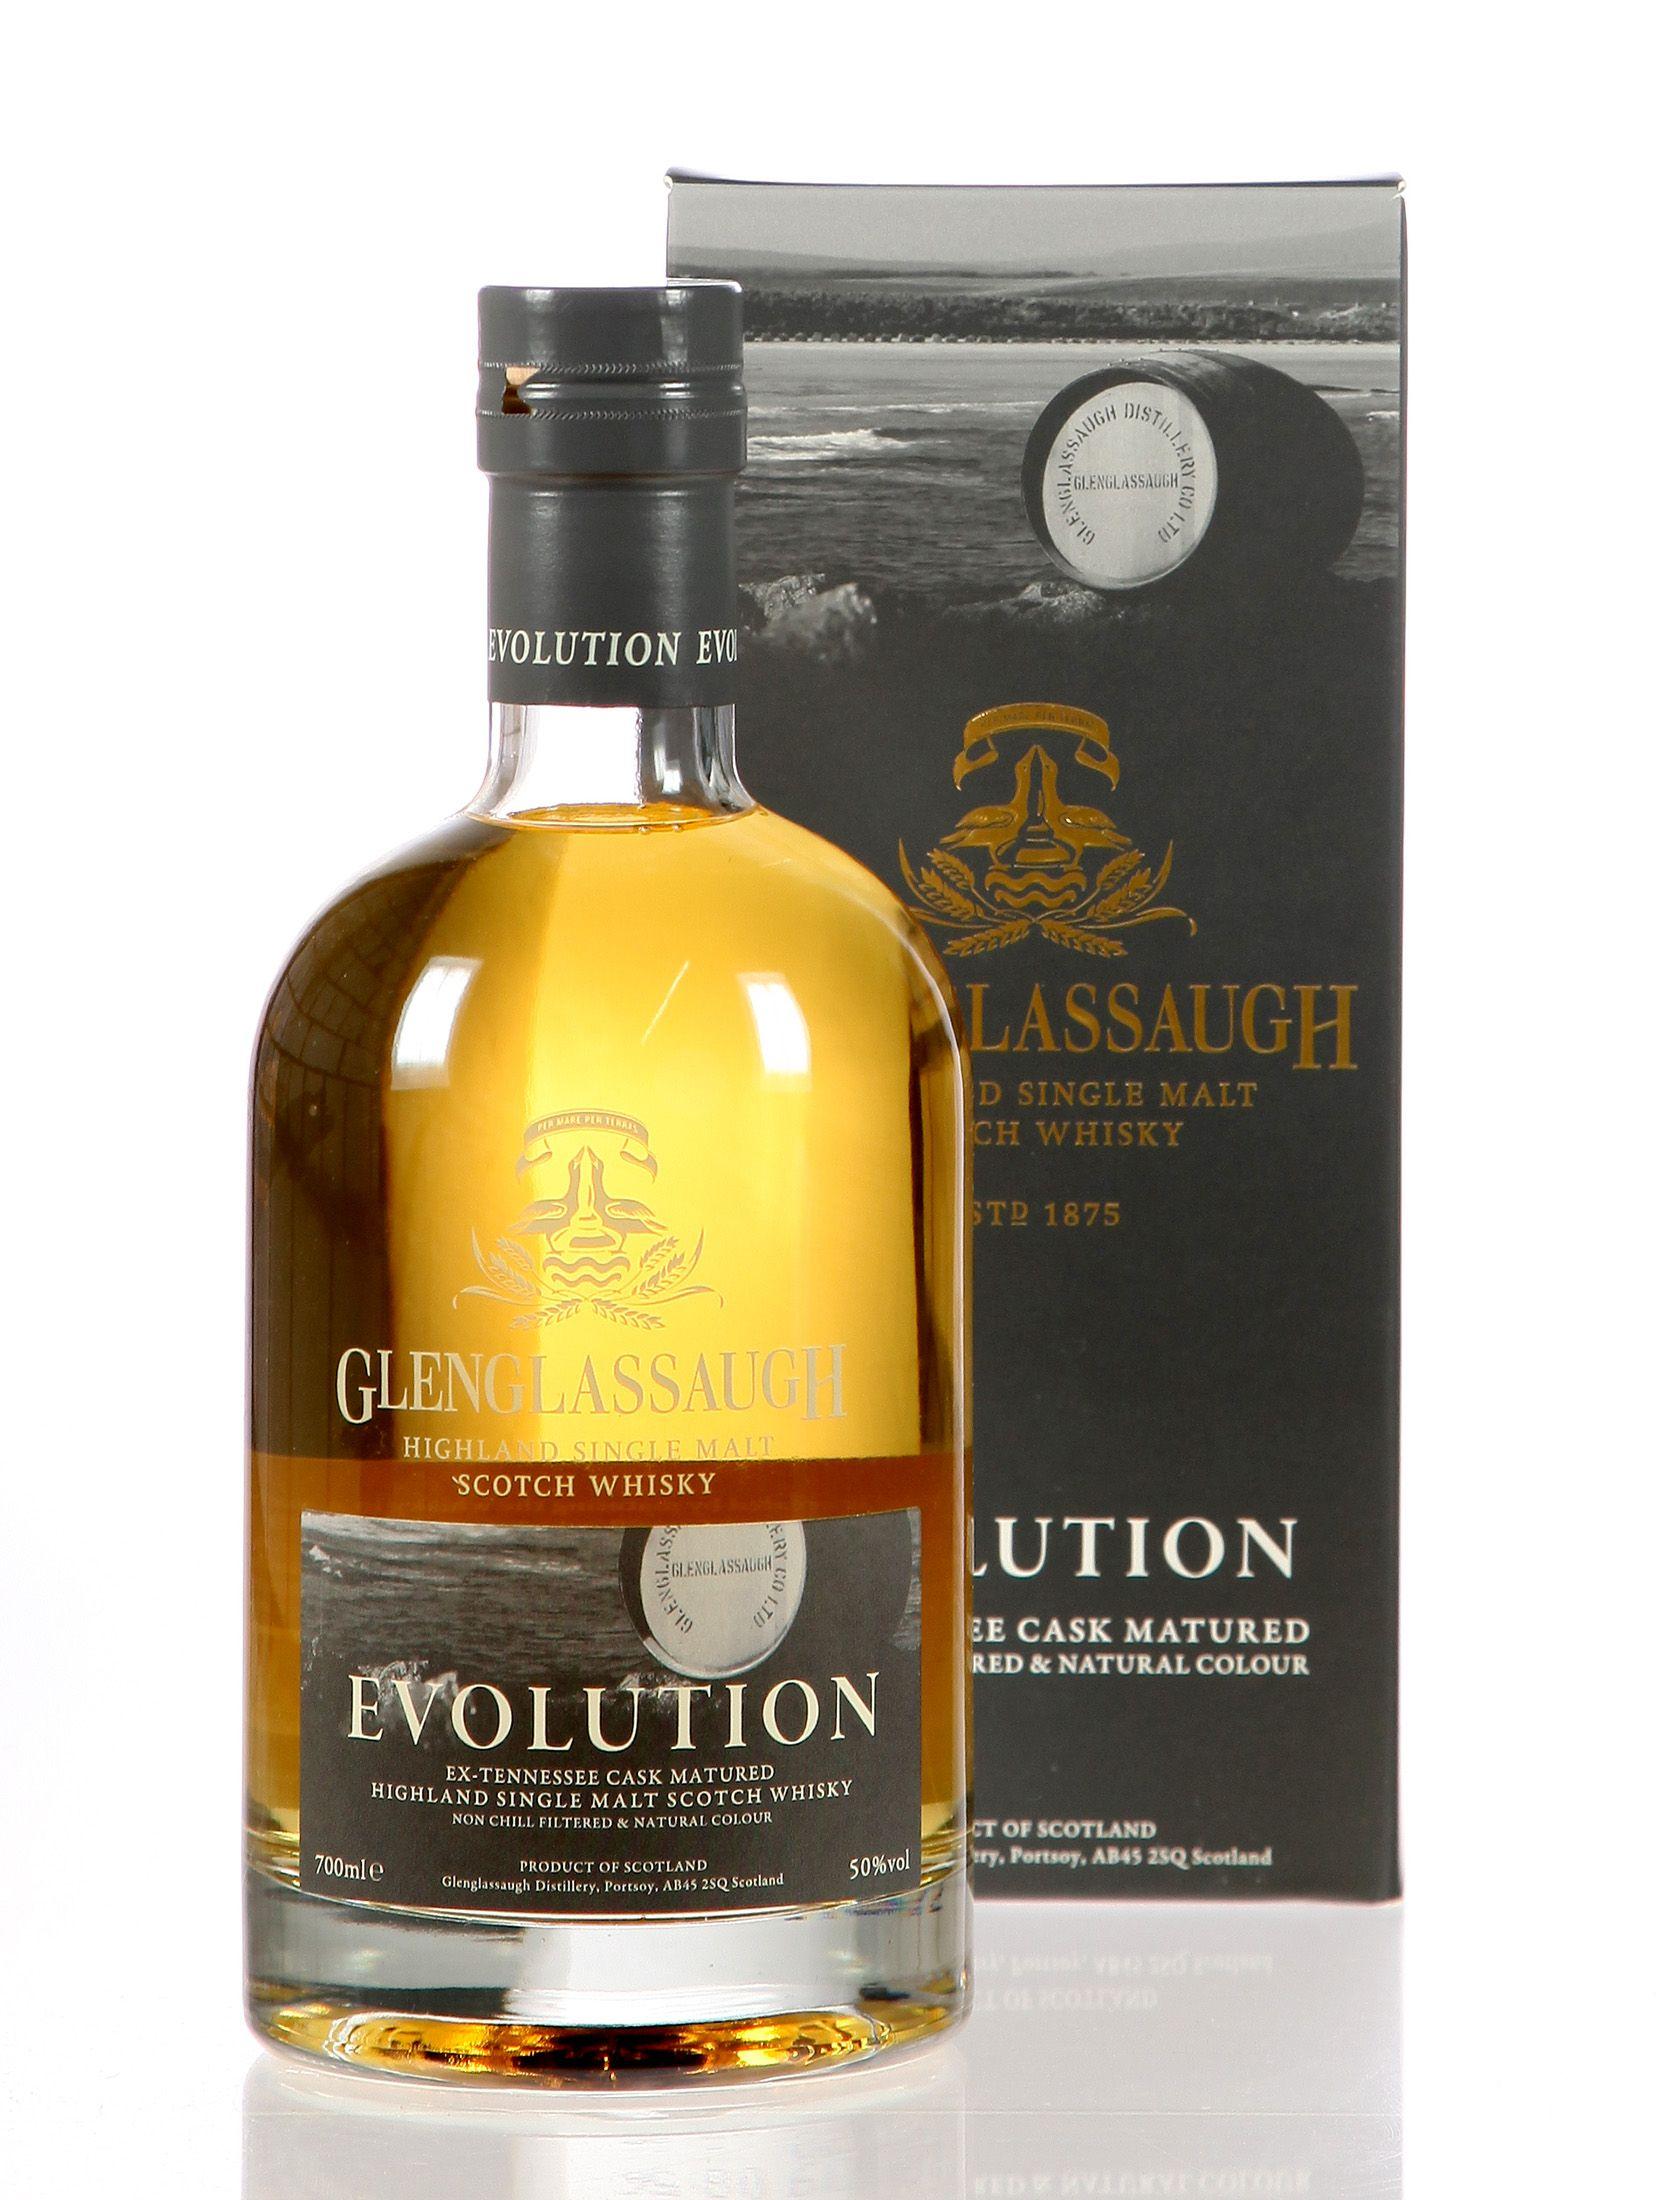 Glenglassaugh Evolution